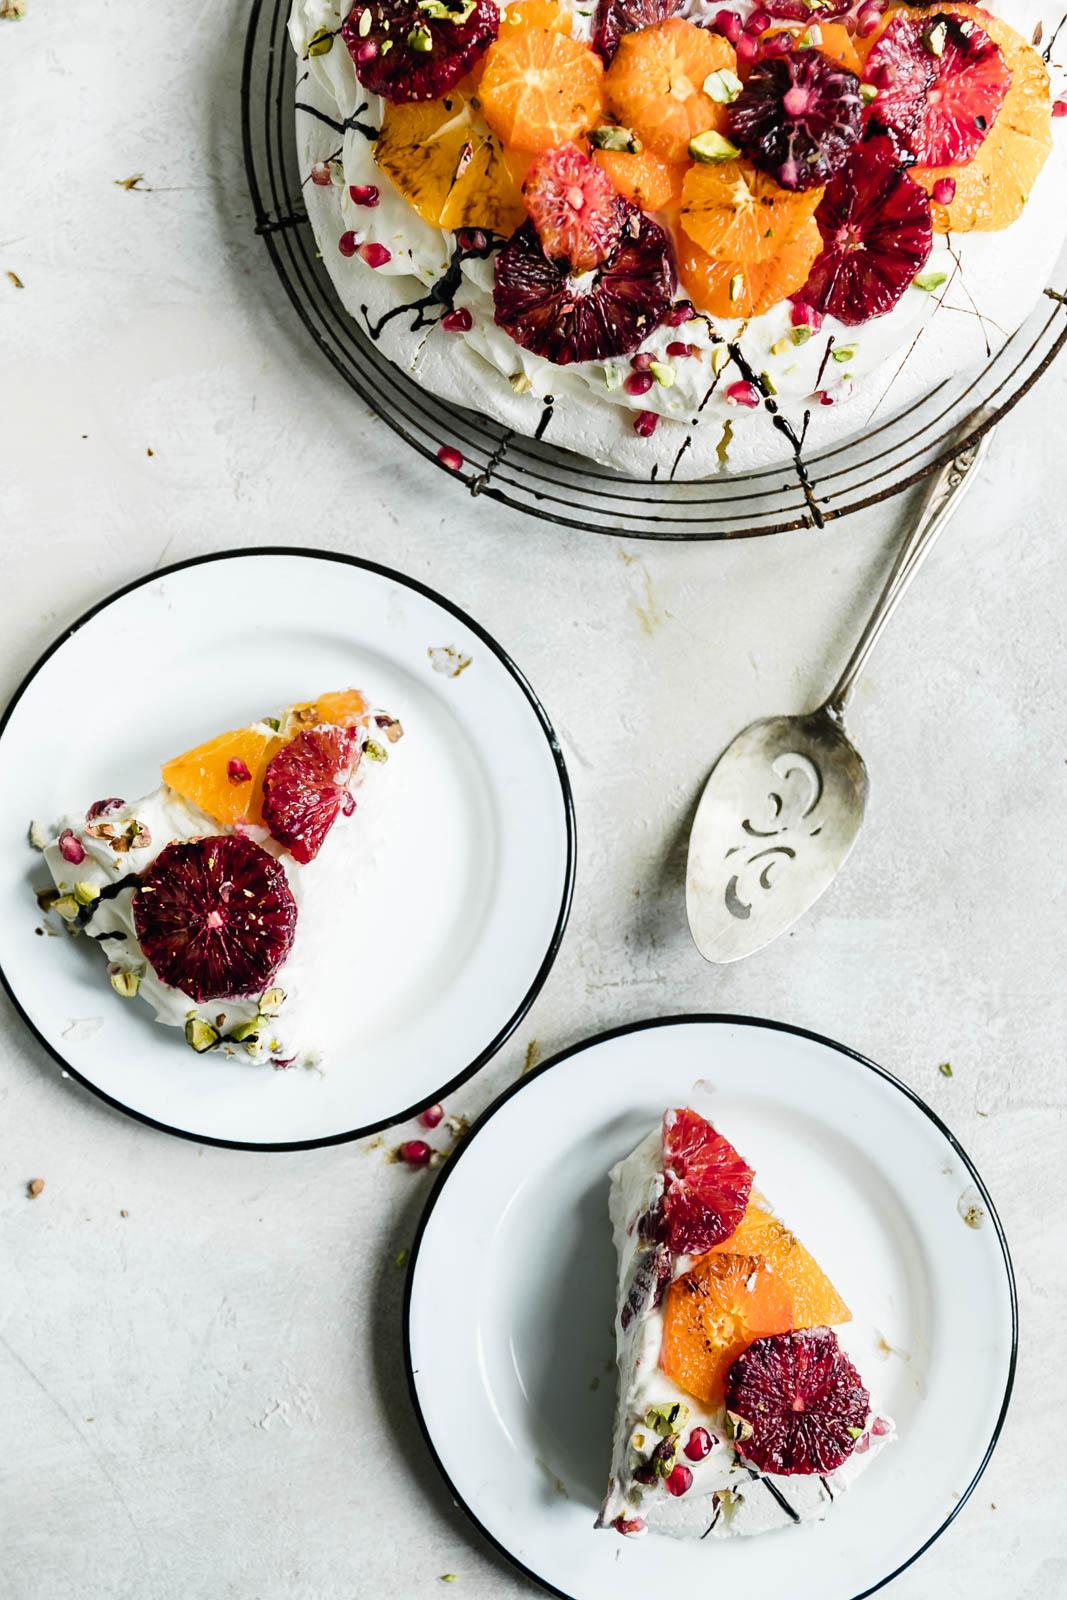 slice of citrus pavlova cake on a plate